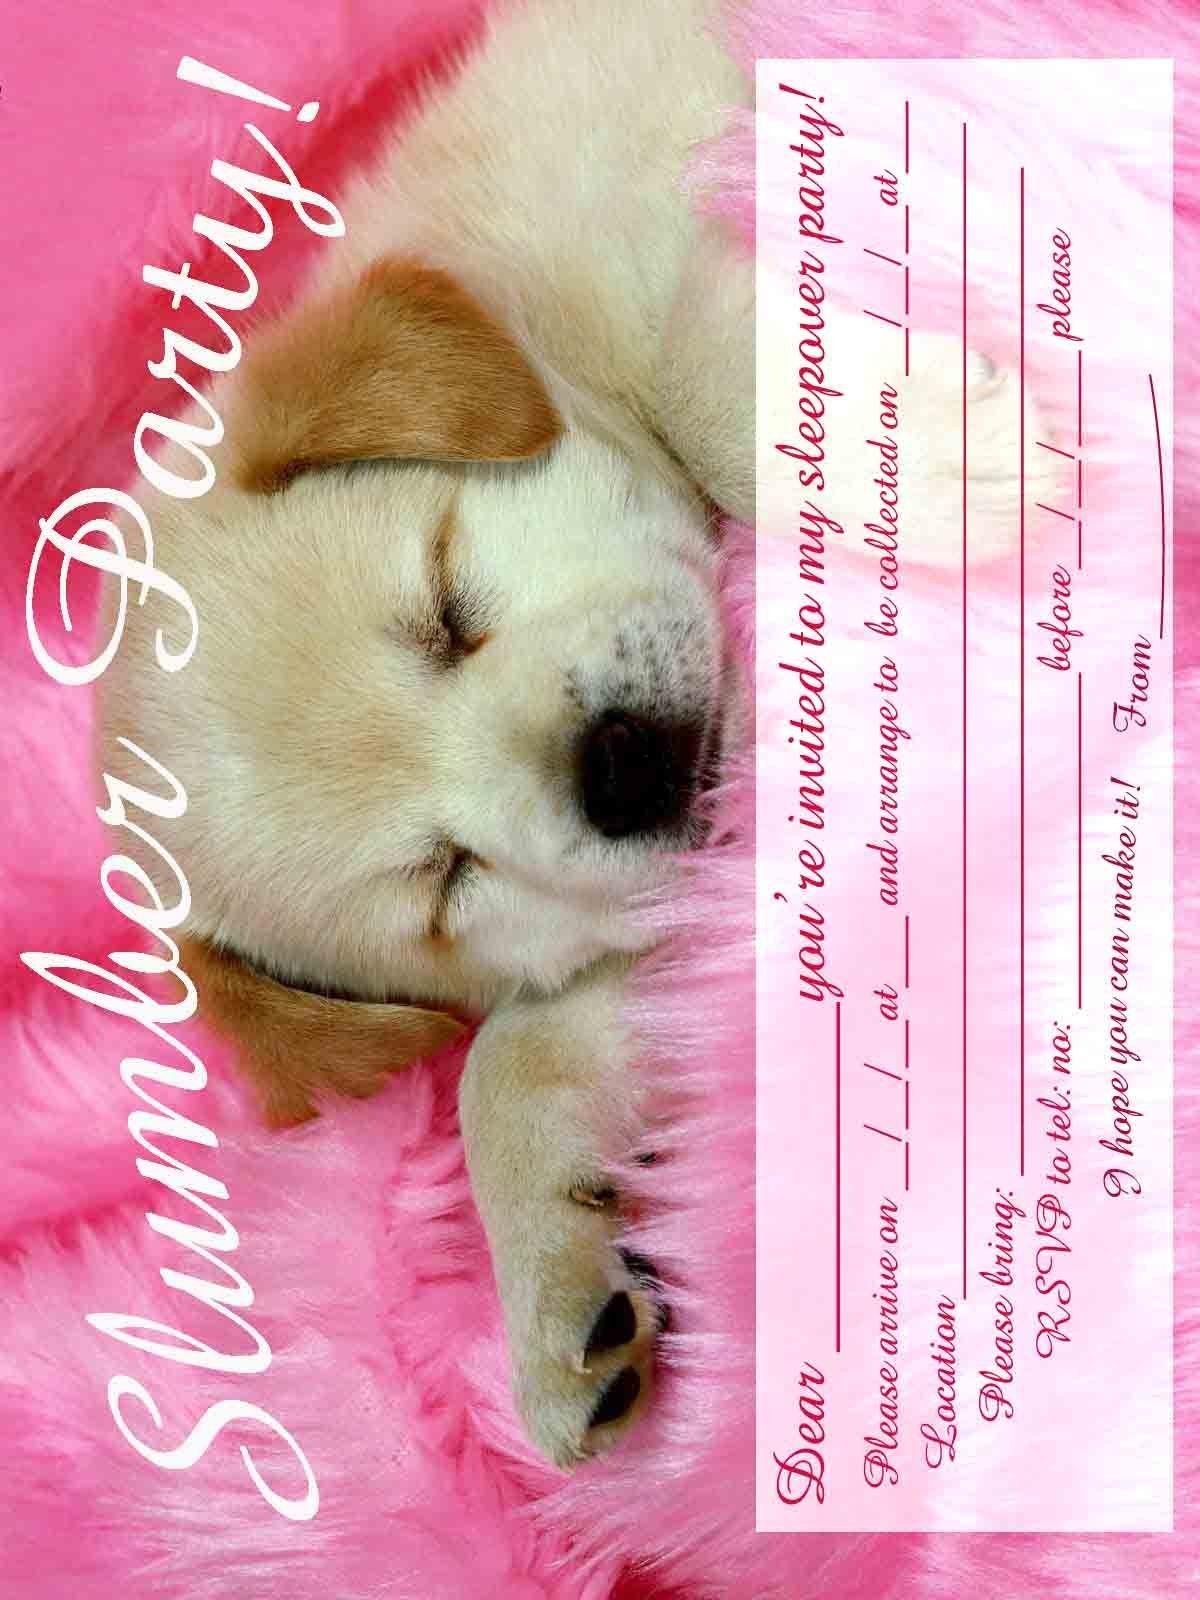 12 year old slumber party invitations visorgede sleepover invitations free printable slumber party filmwisefo